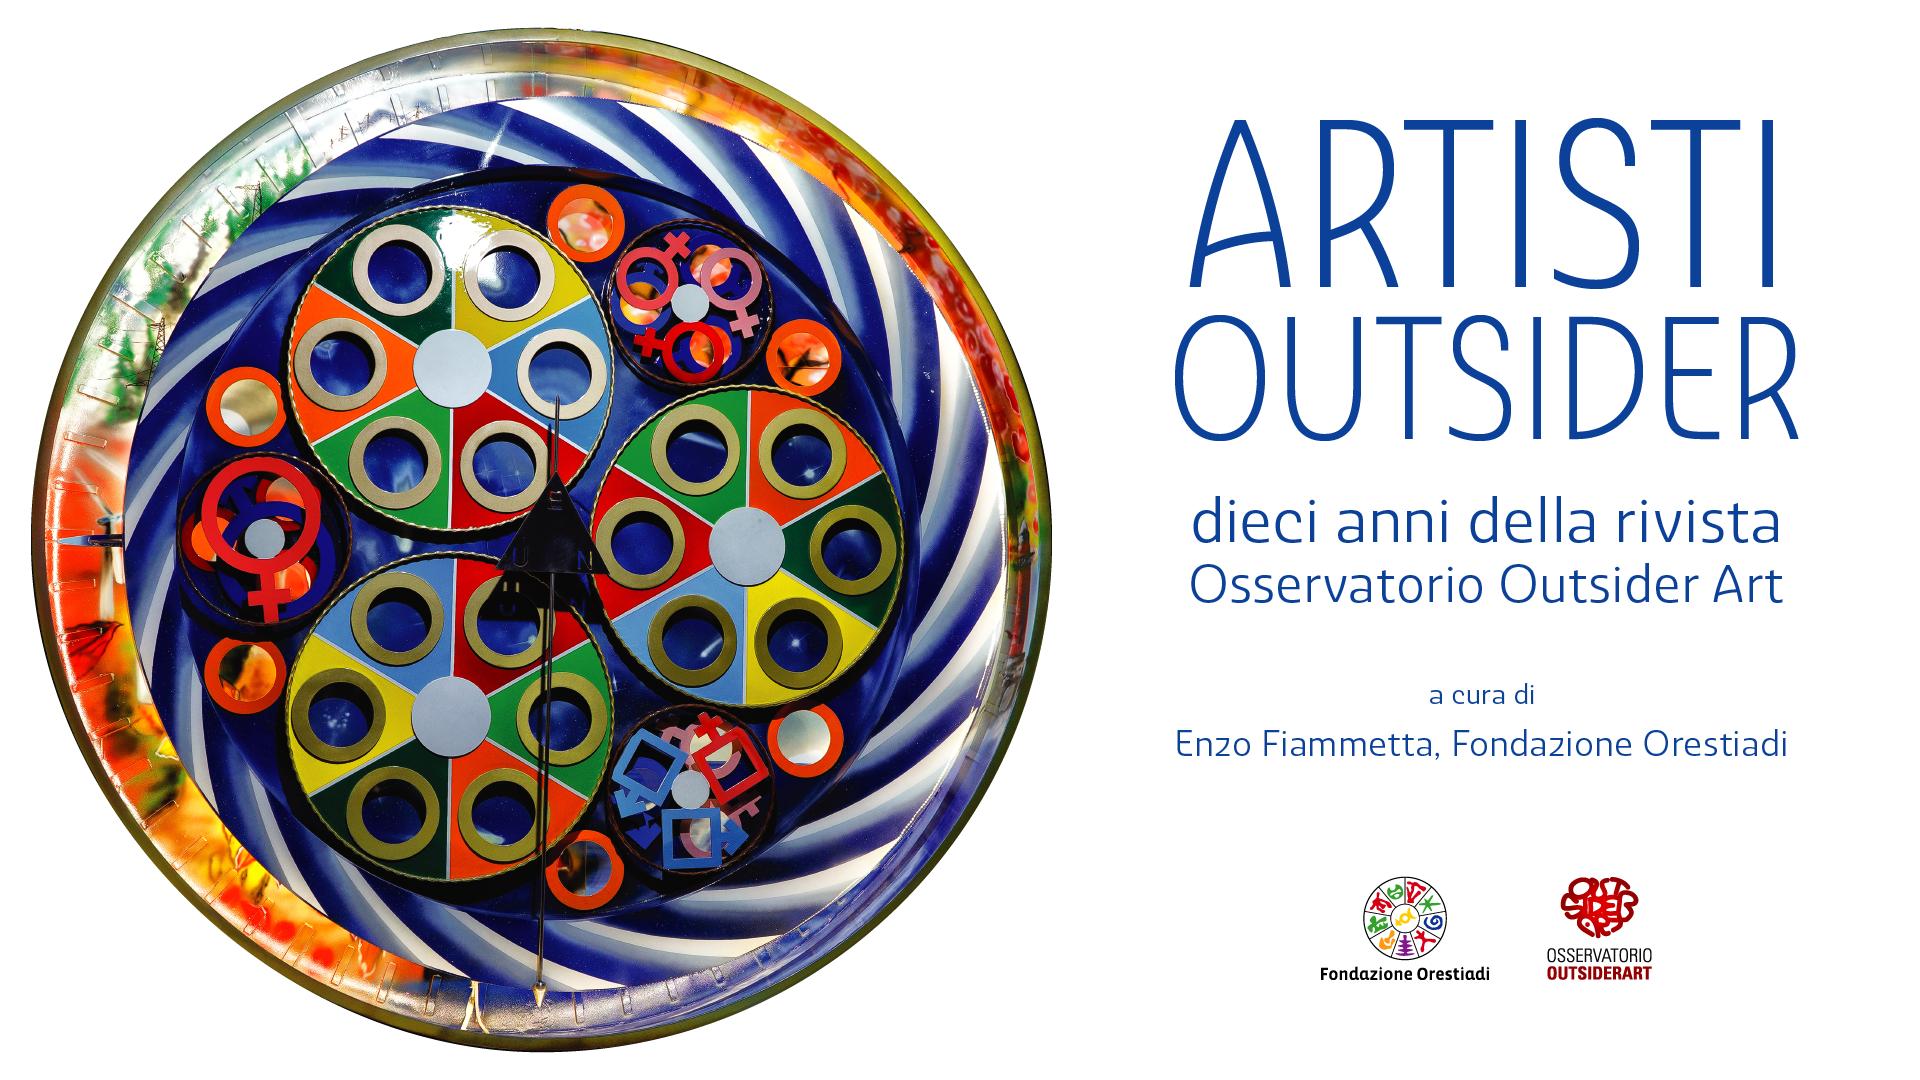 ARTISTI OUTSIDER